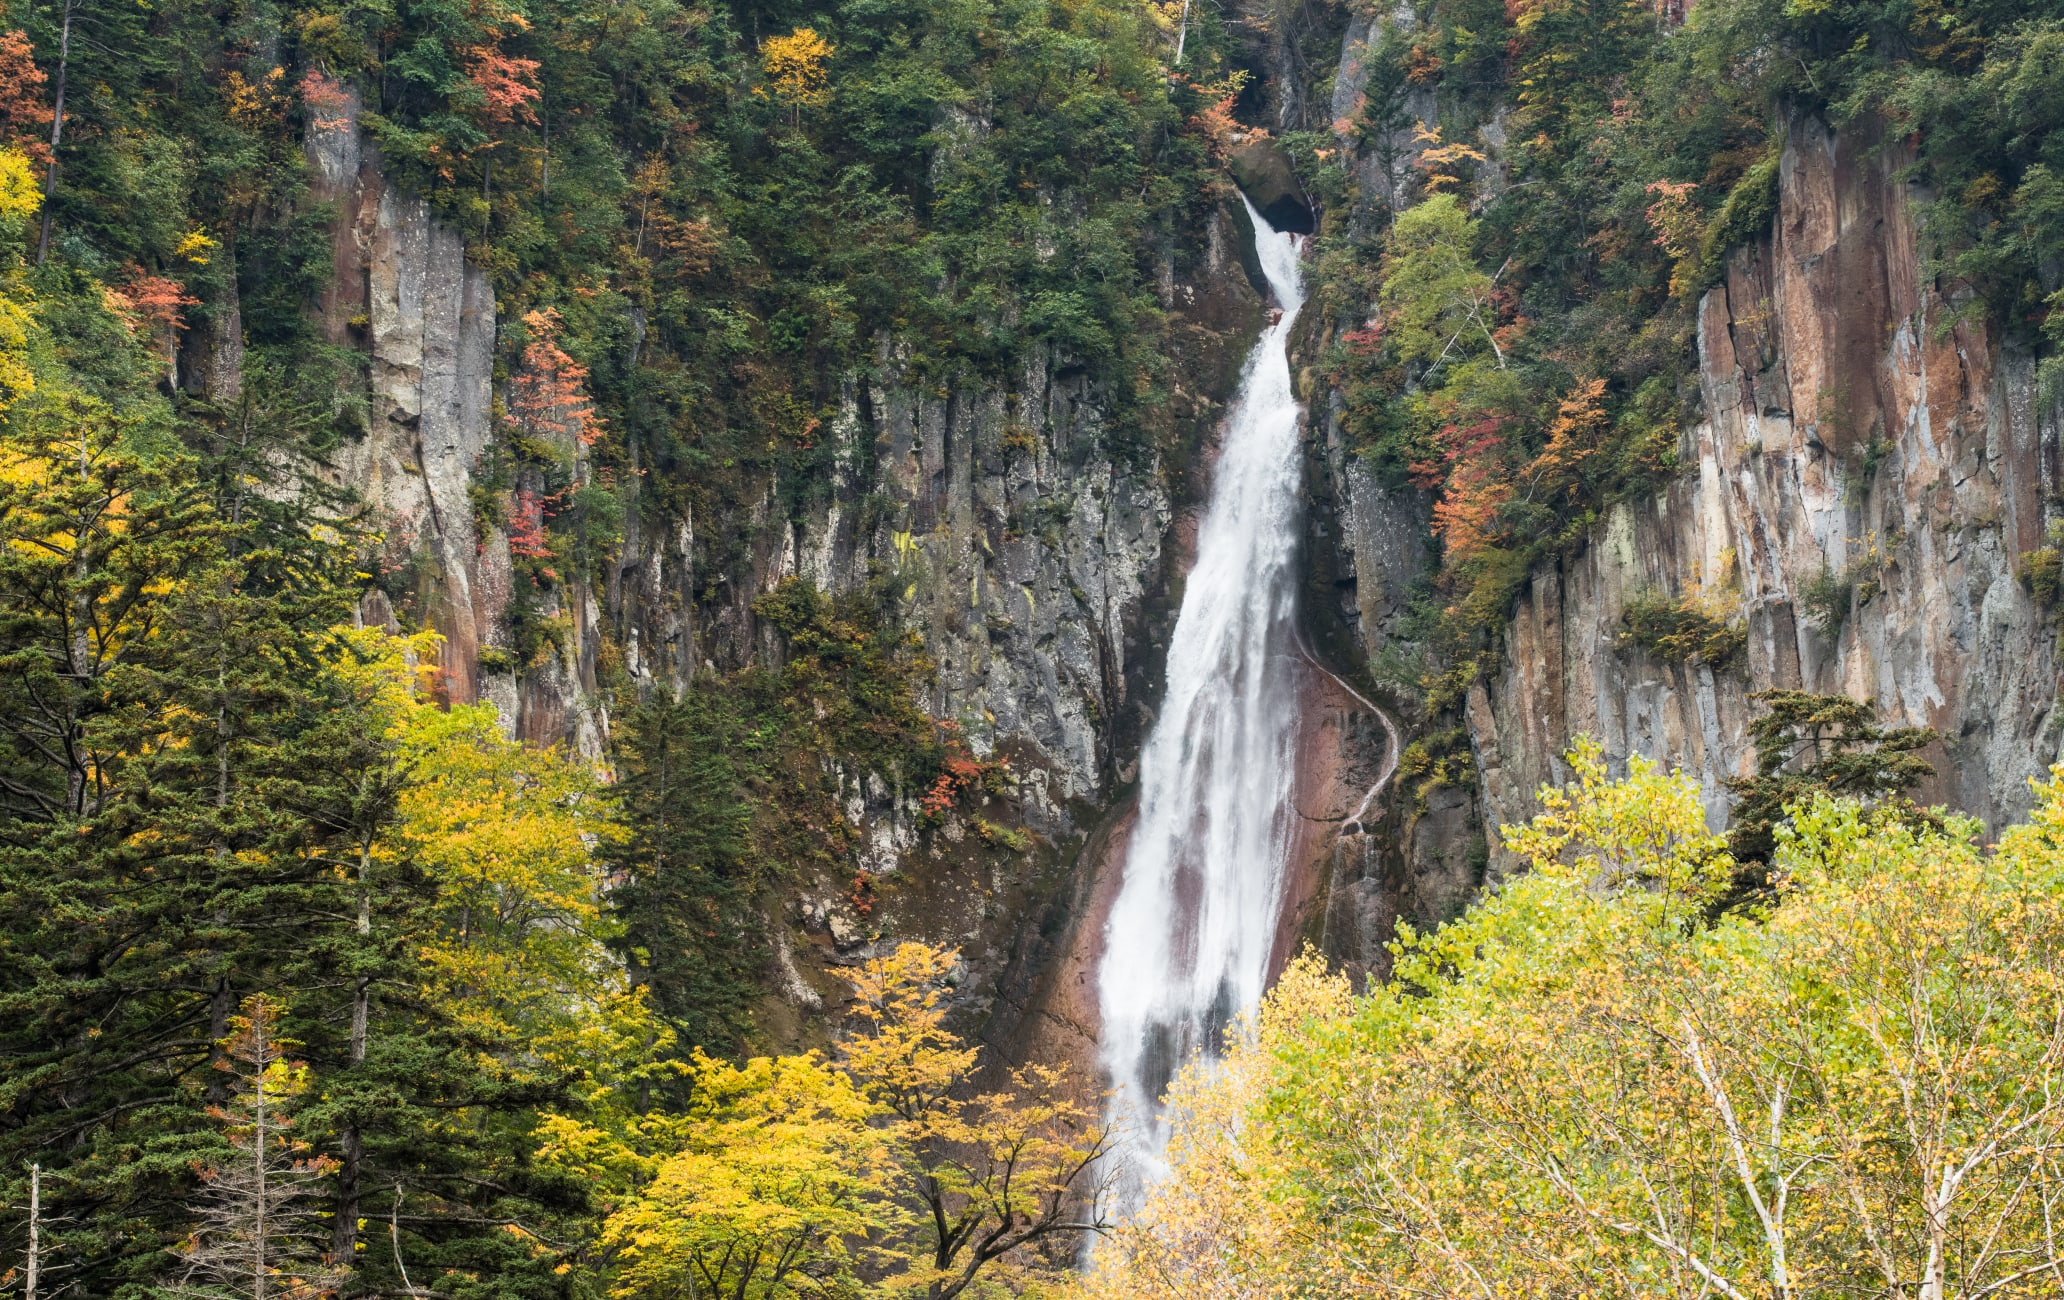 Ryusei-no-taki Falls